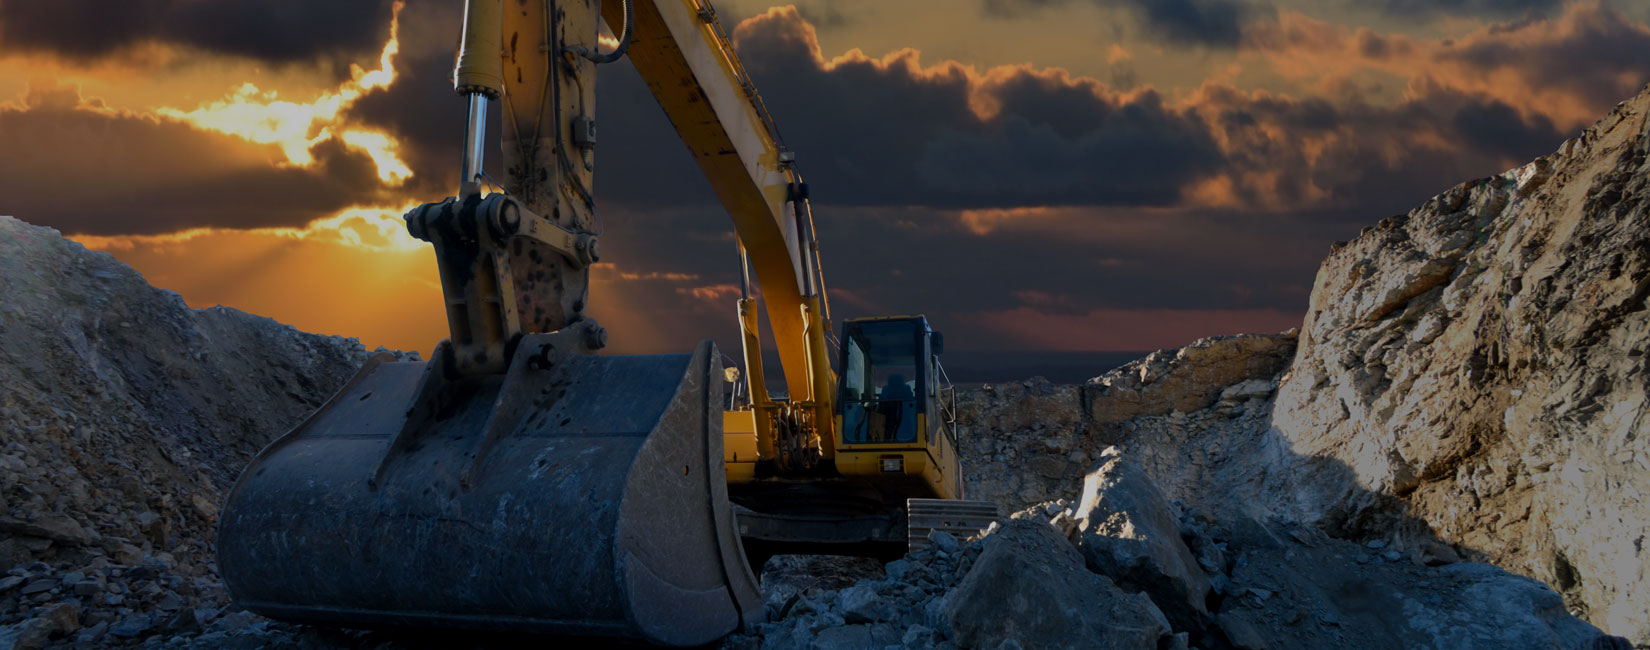 Hogg Brothers excavator-working-sunset